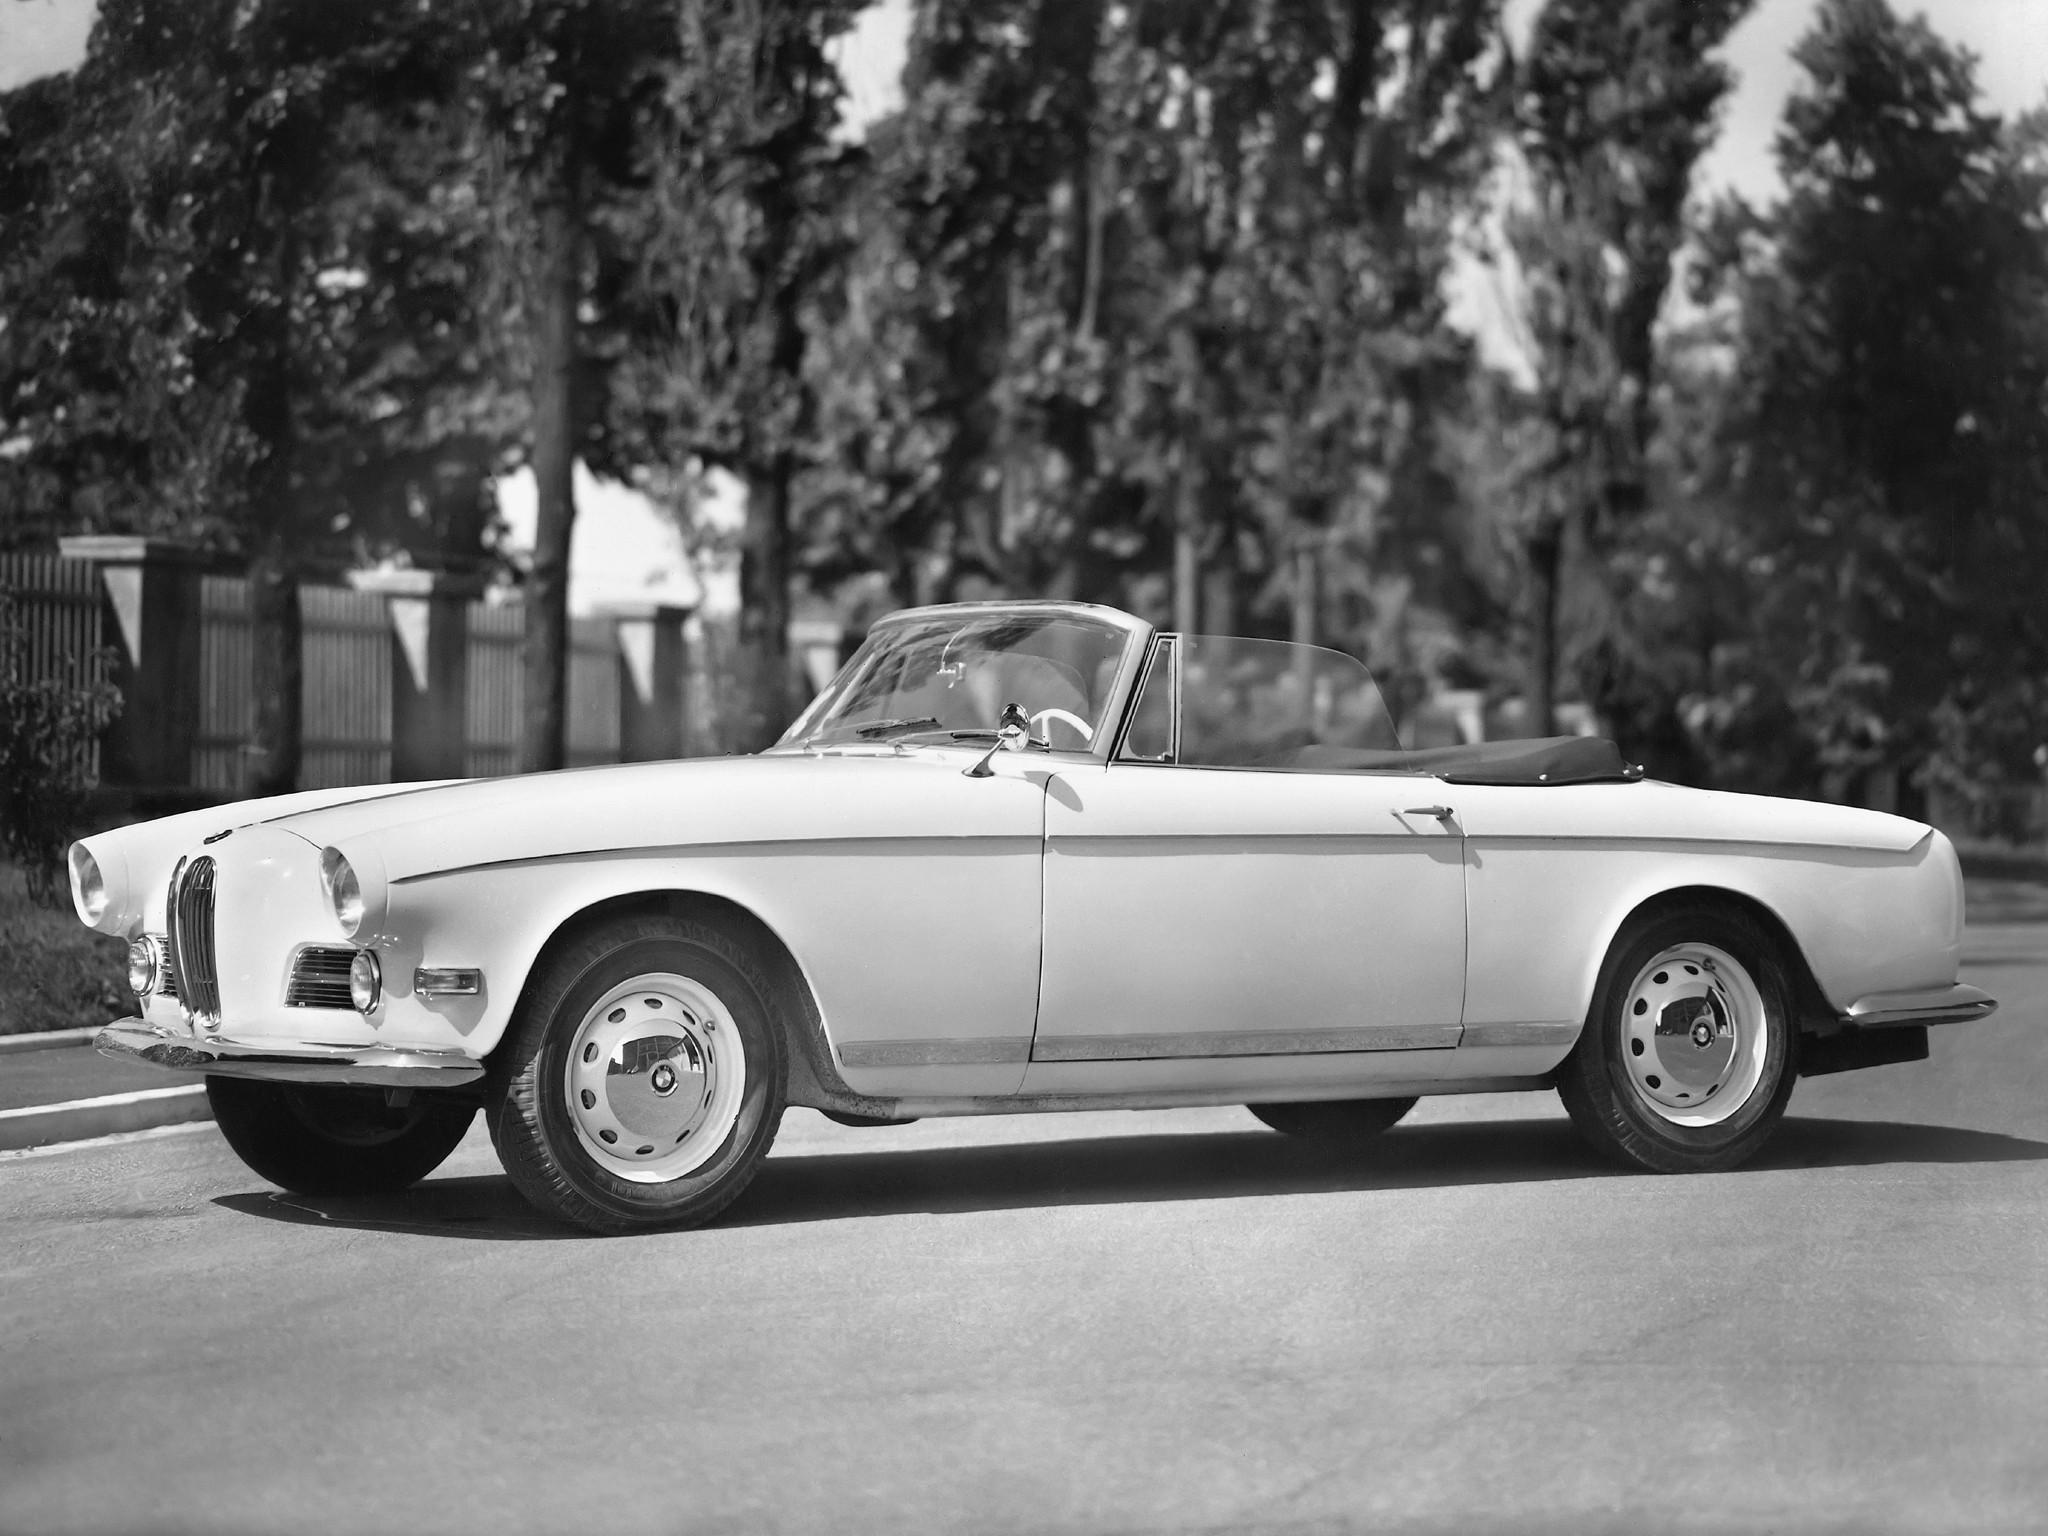 BMW 503 1956 - 1959 Cabriolet #2